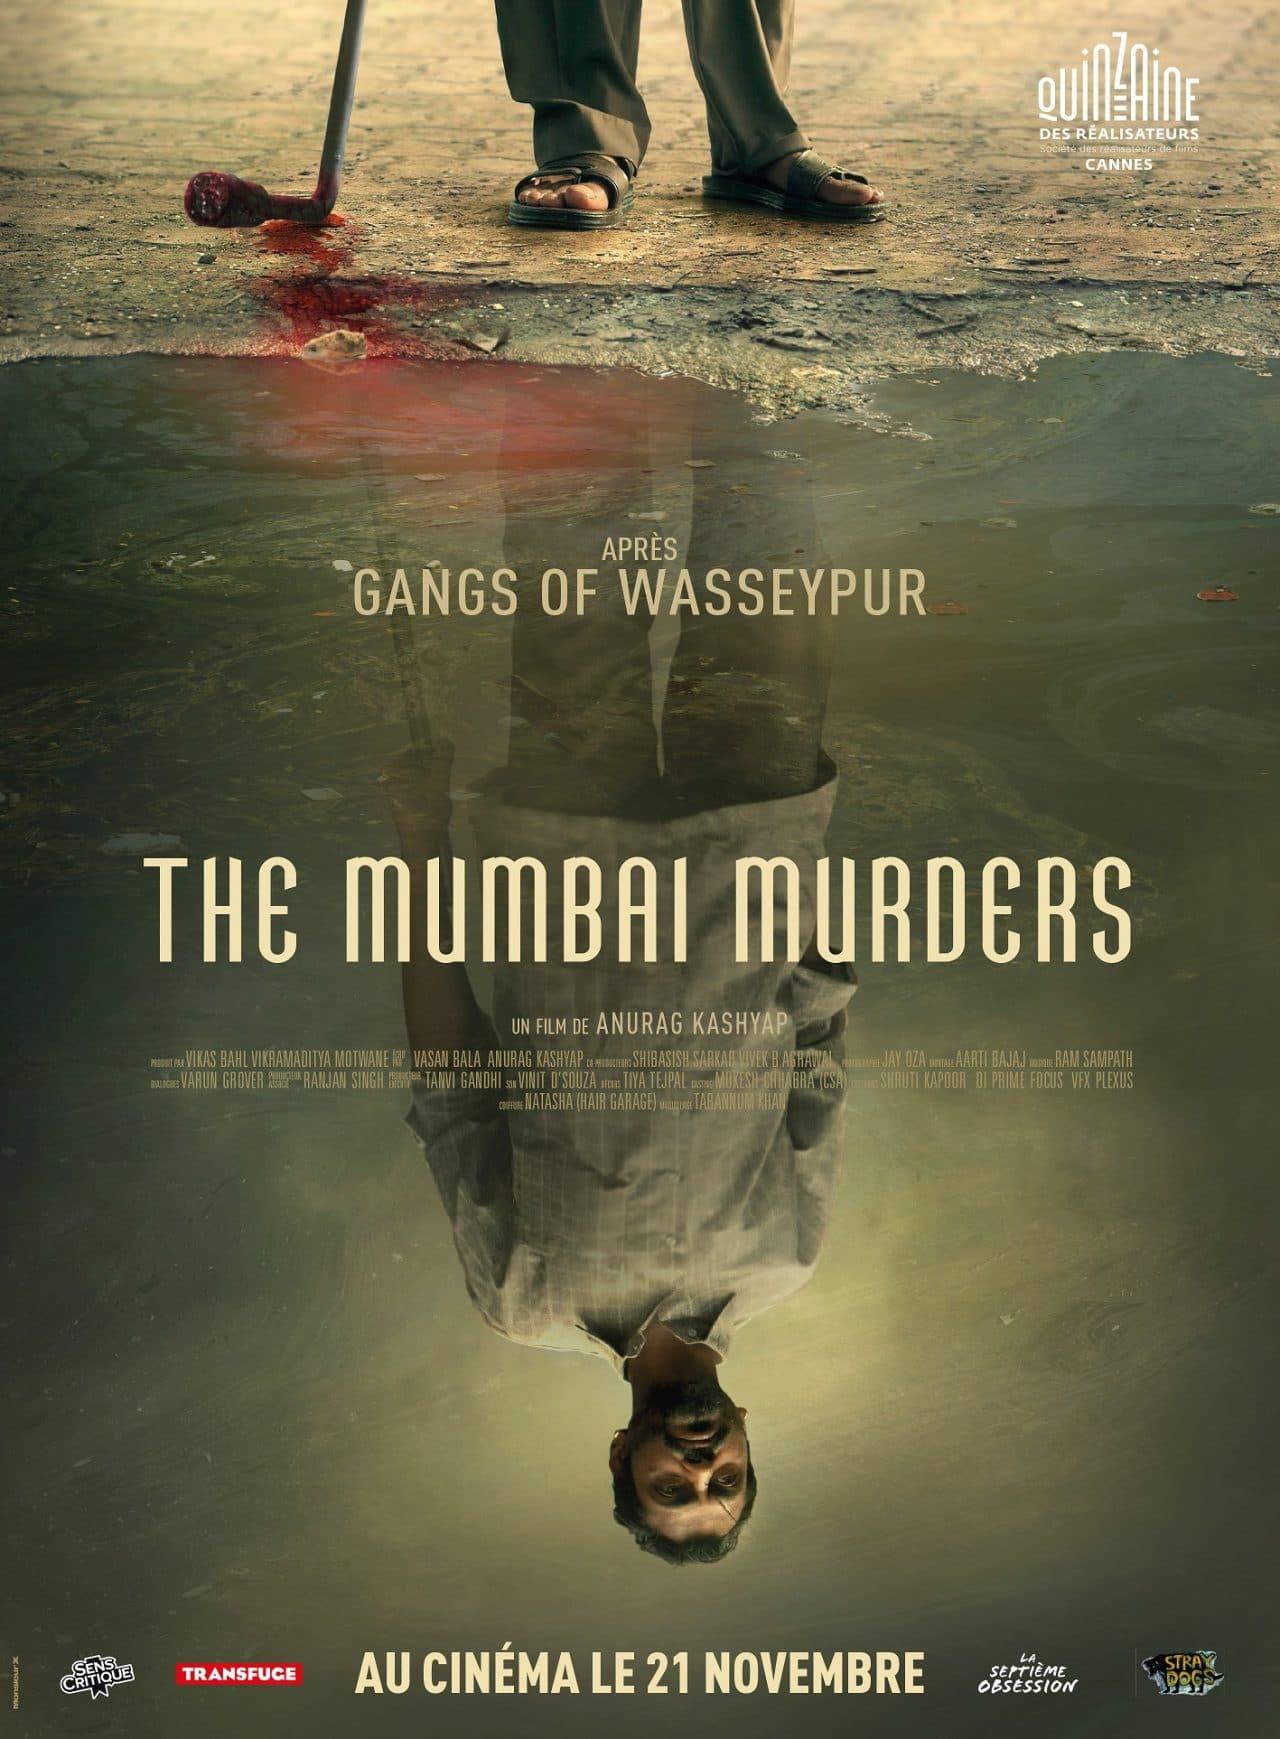 Affiche Mumbai murders